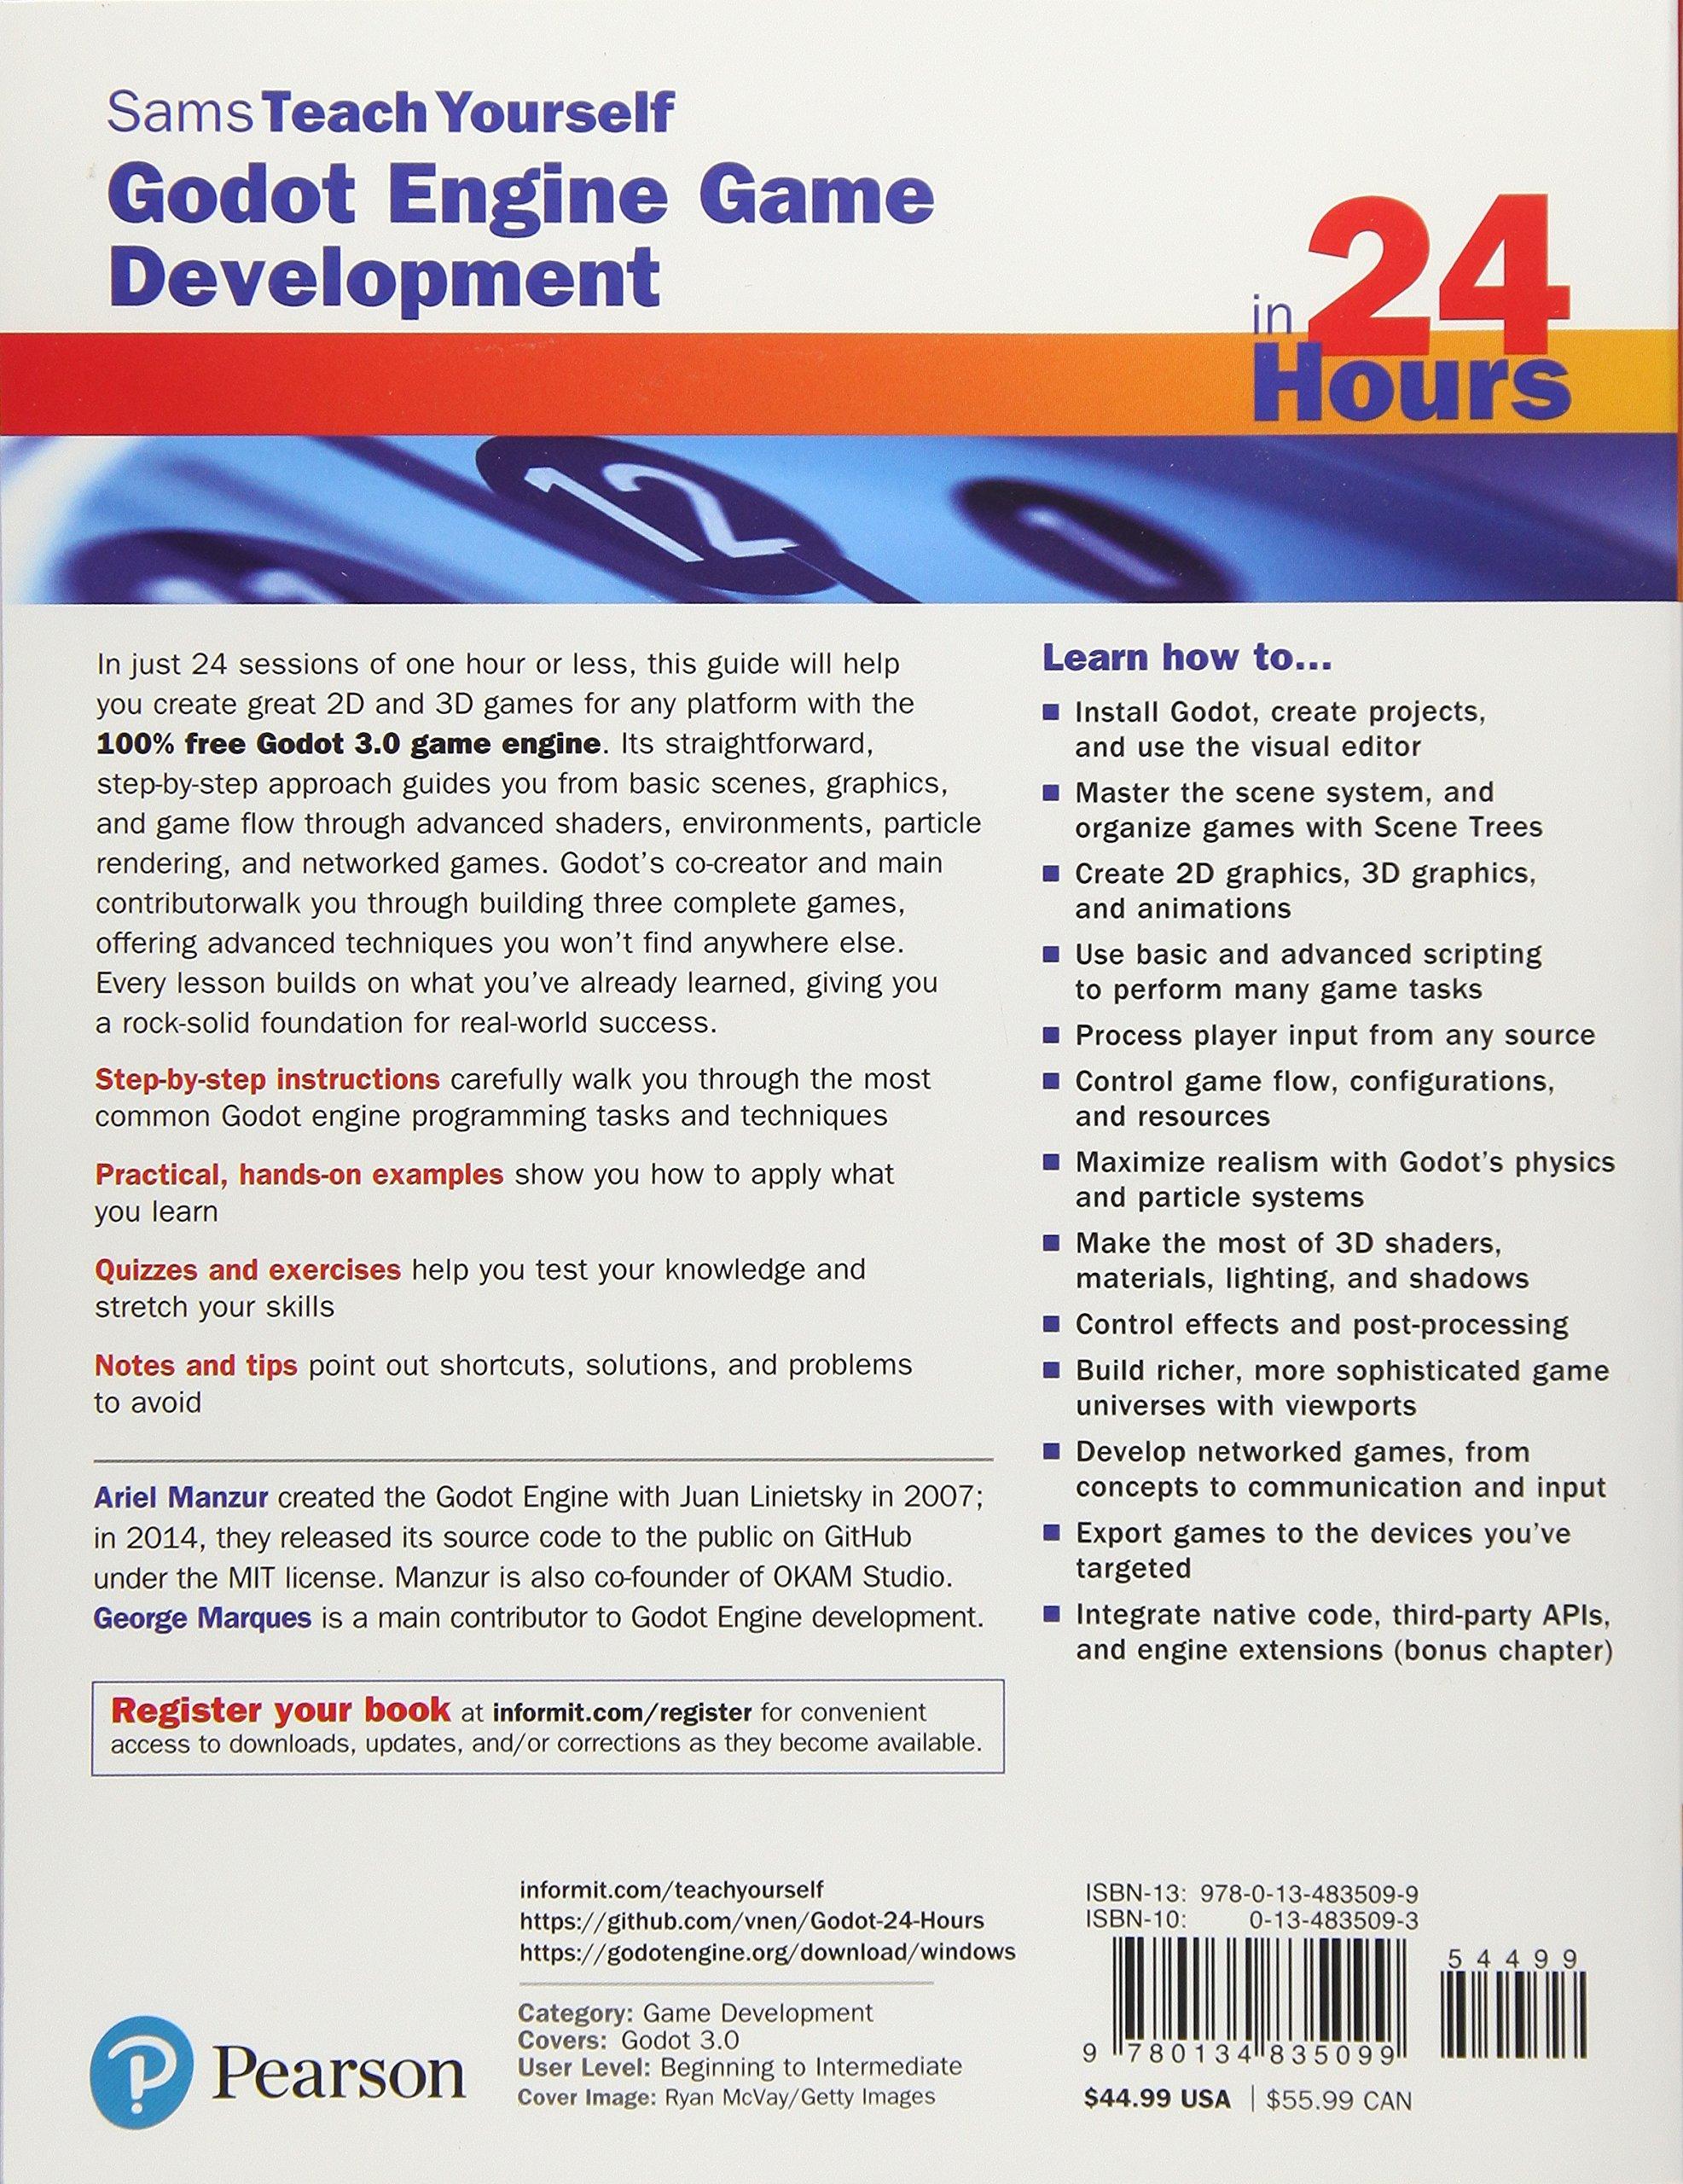 Godot Engine Game Development in 24 Hours, Sams Teach